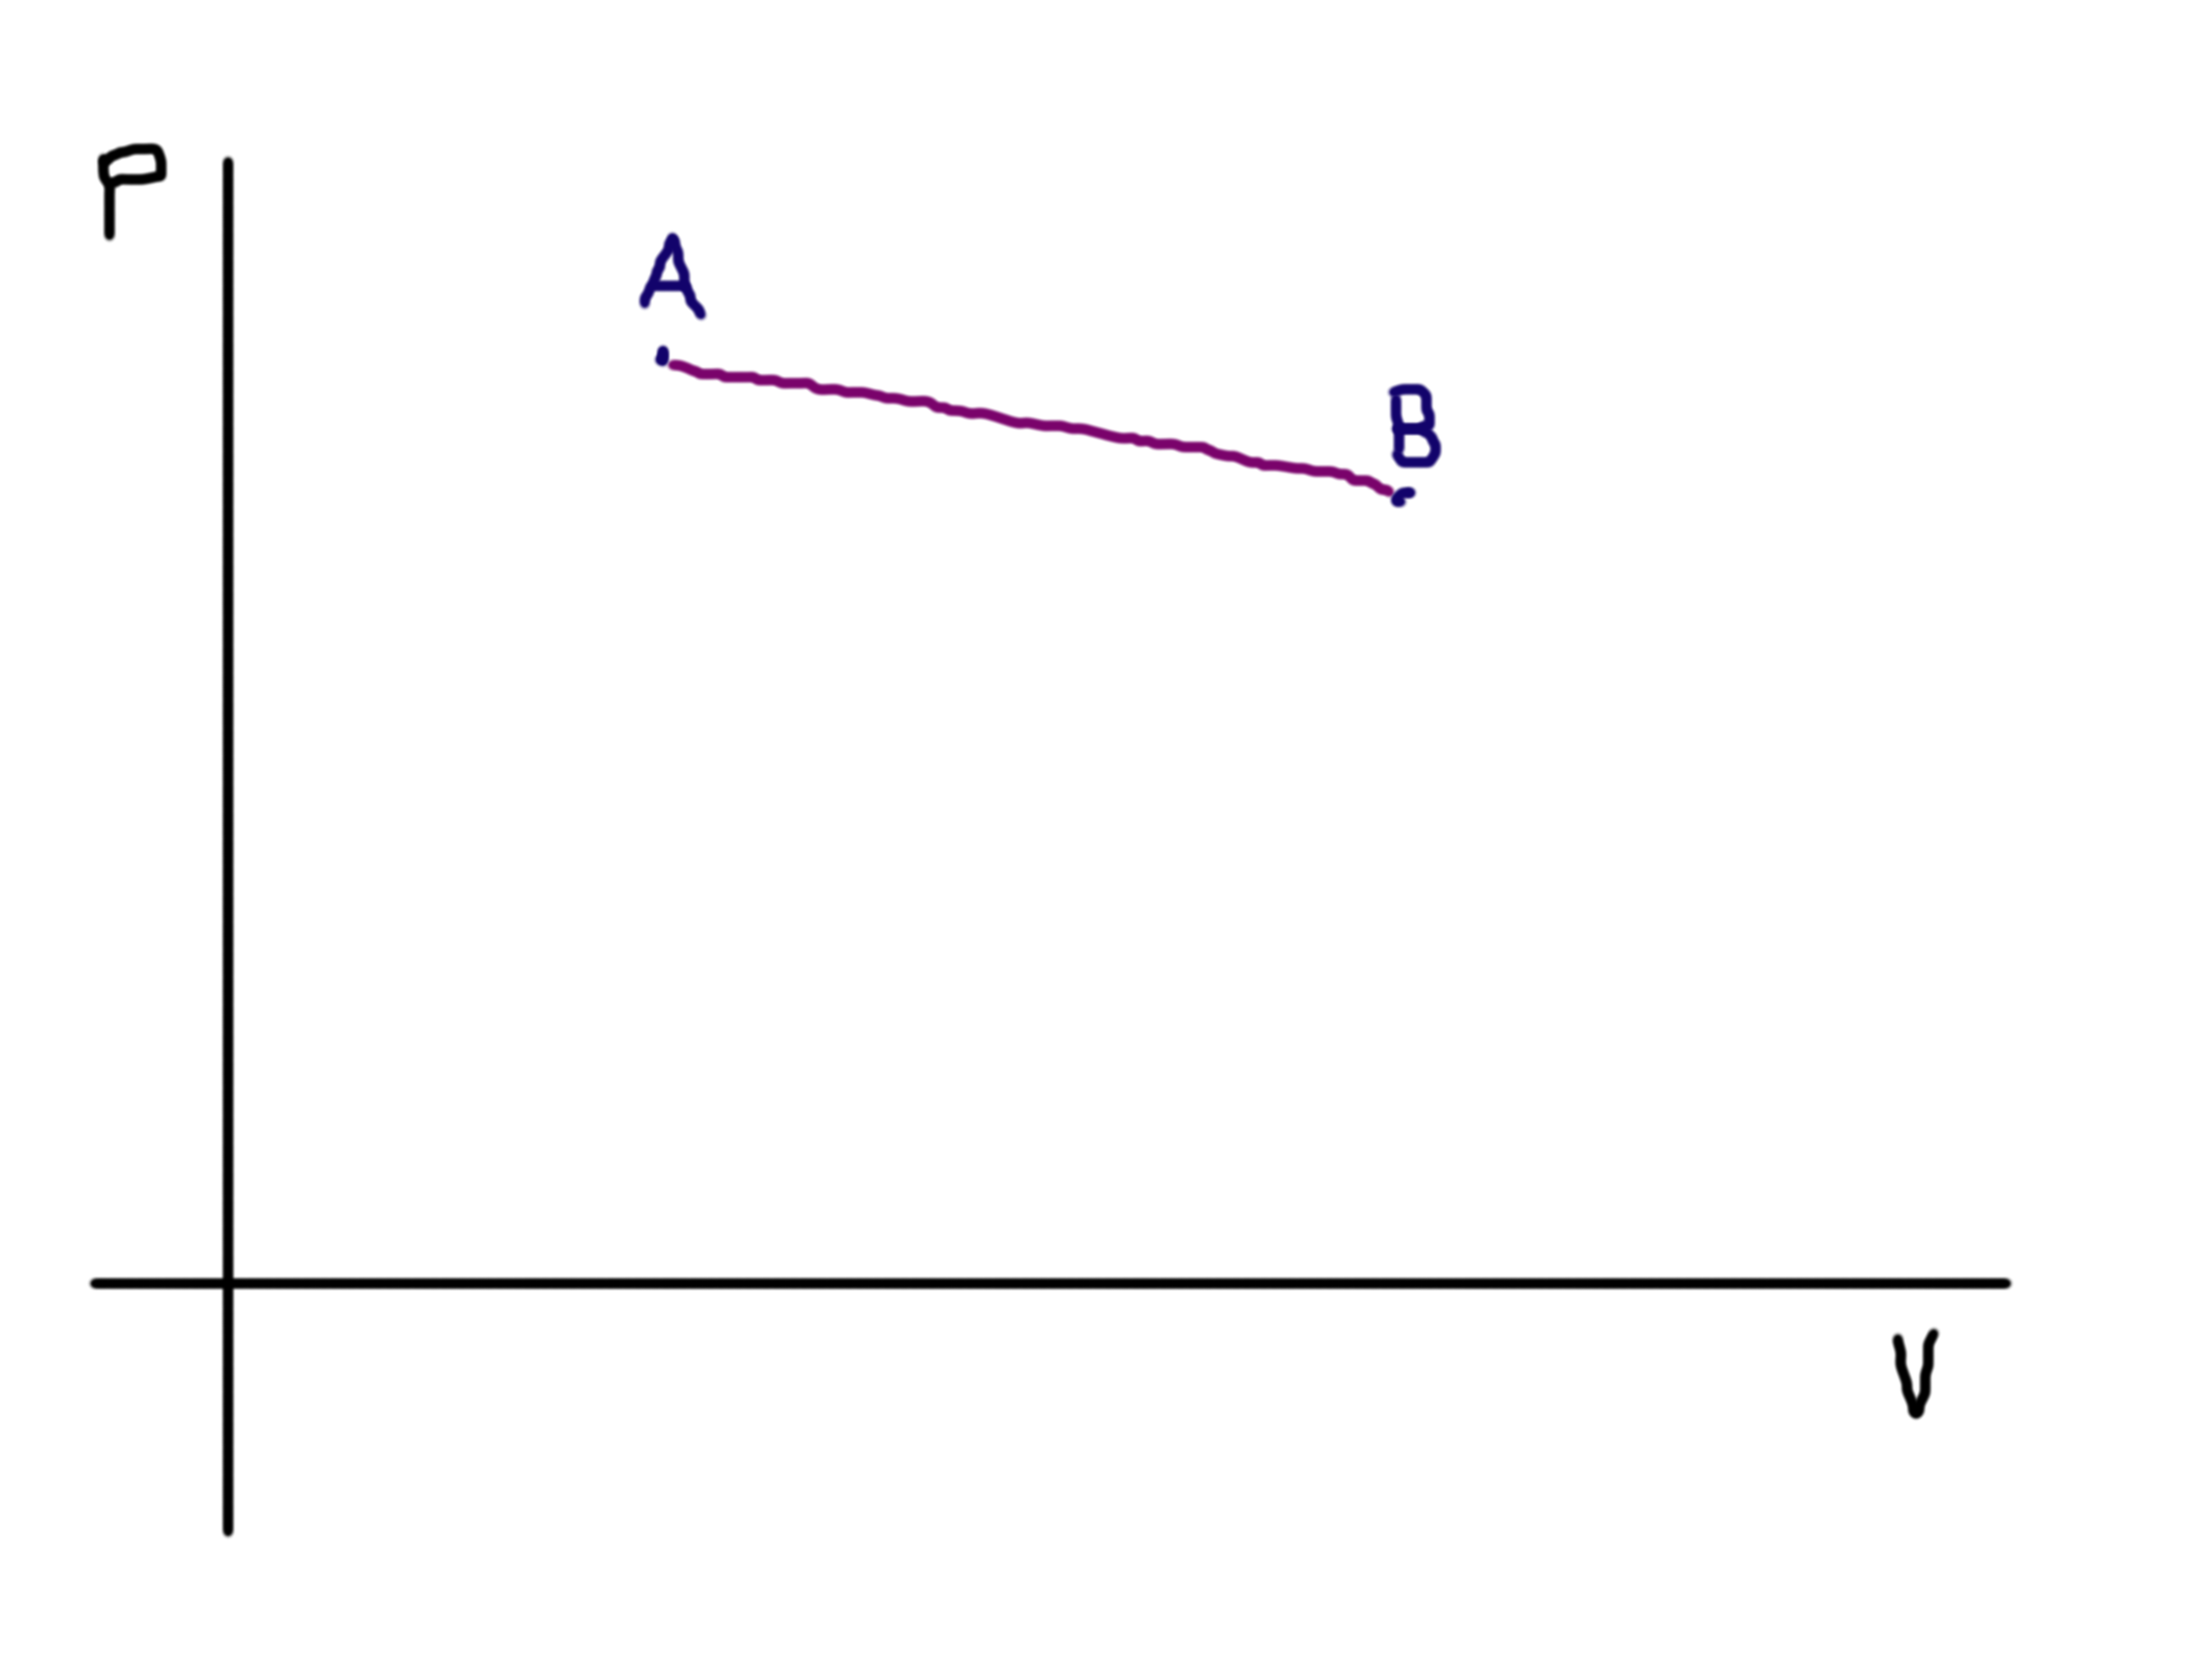 pv graf -- AB